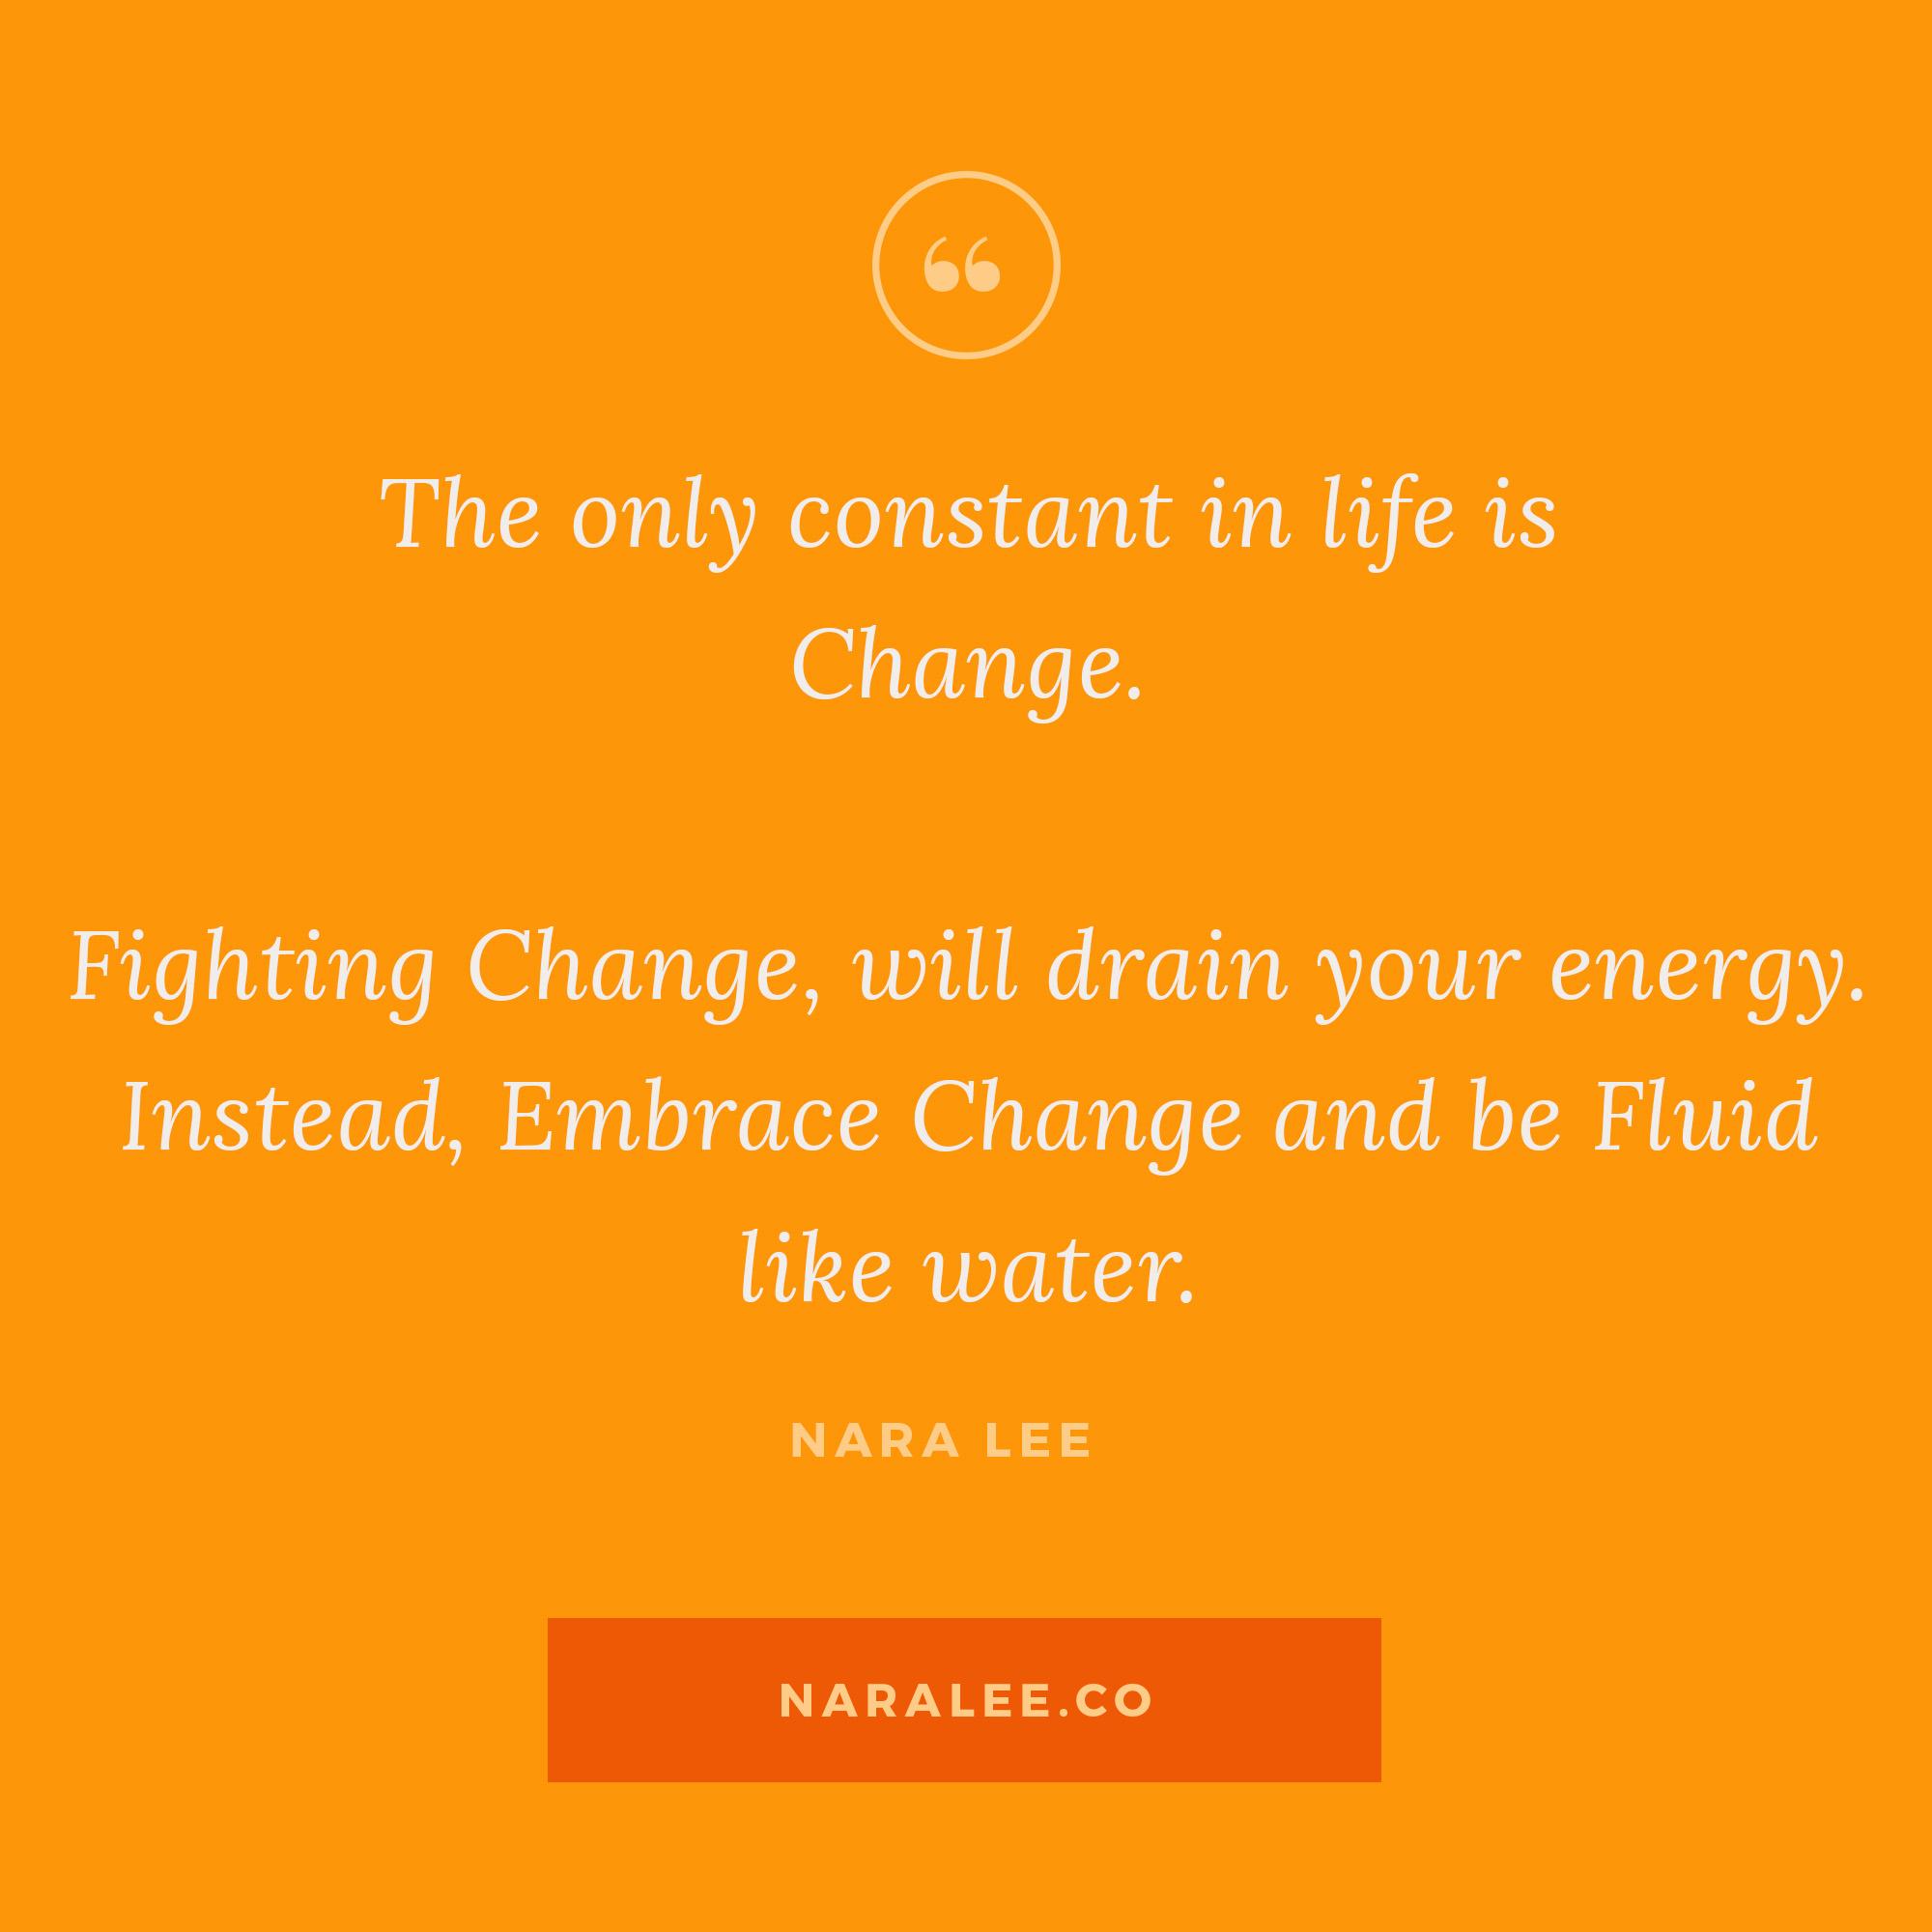 [Rising-Strong-Quotes] Nara Lee Quotes - Embracing Change.jpg